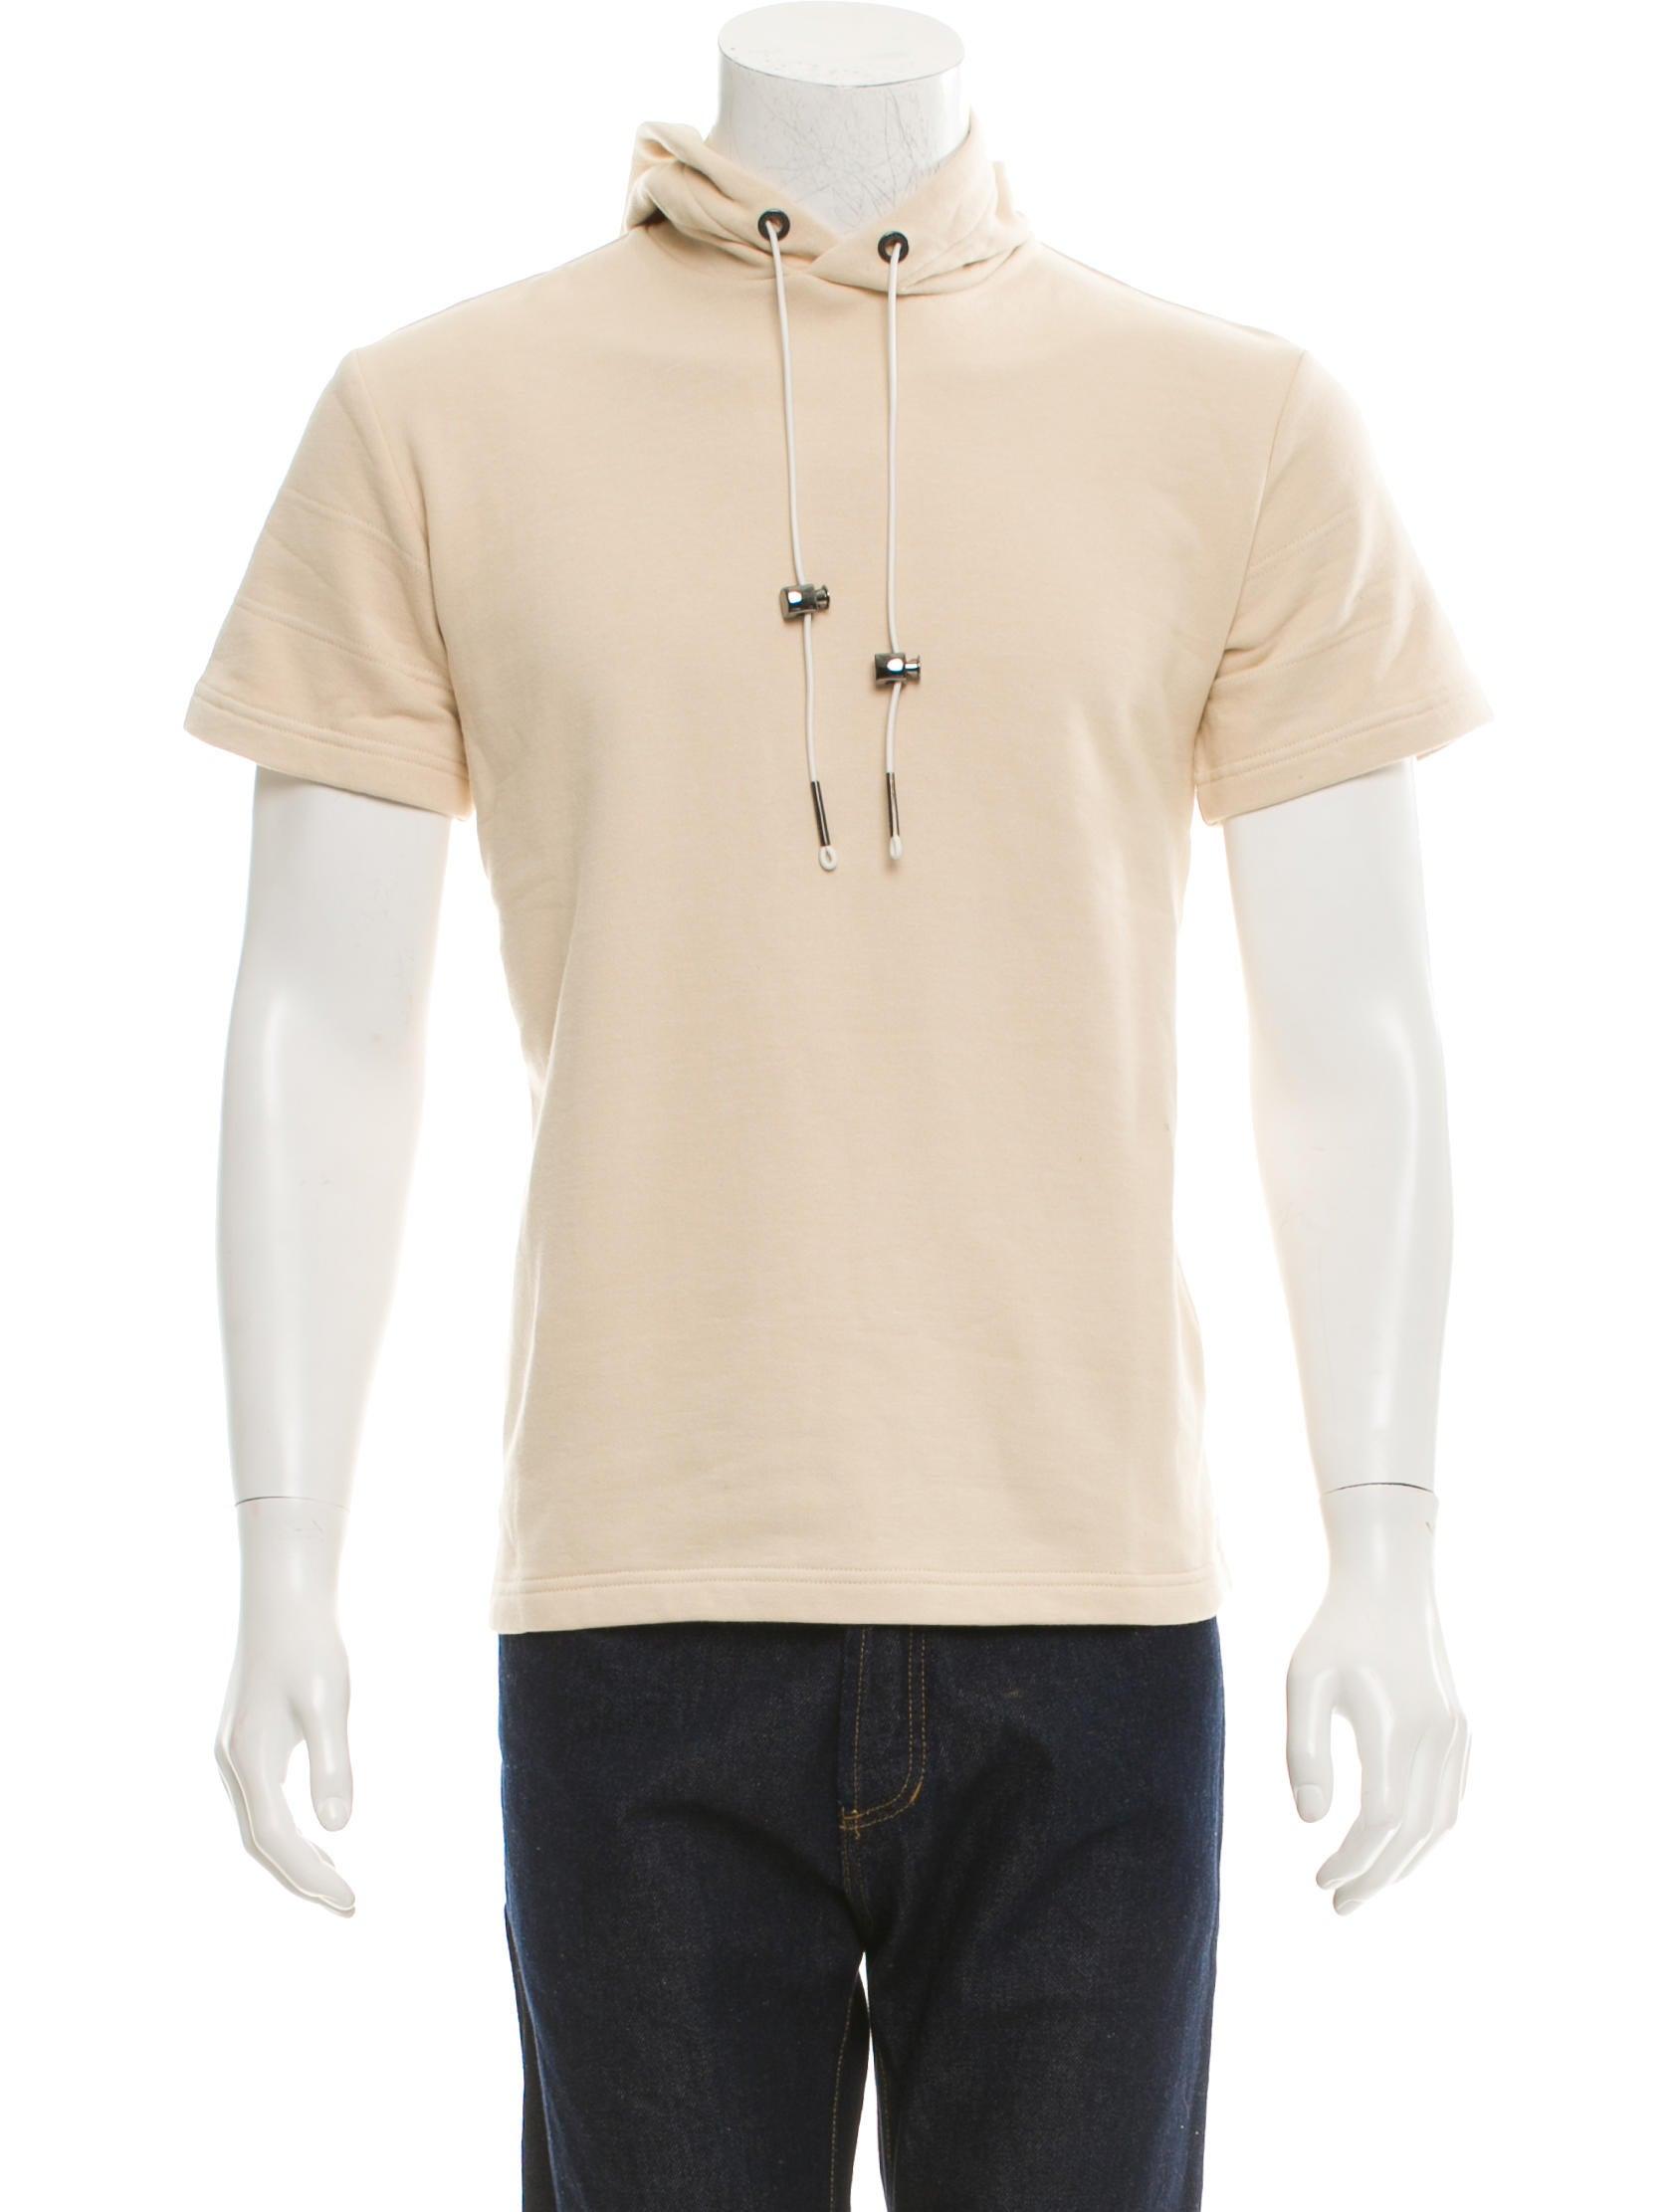 Rochambeau Hooded Short Sleeve Sweatshirt w/ Tags - Clothing ...